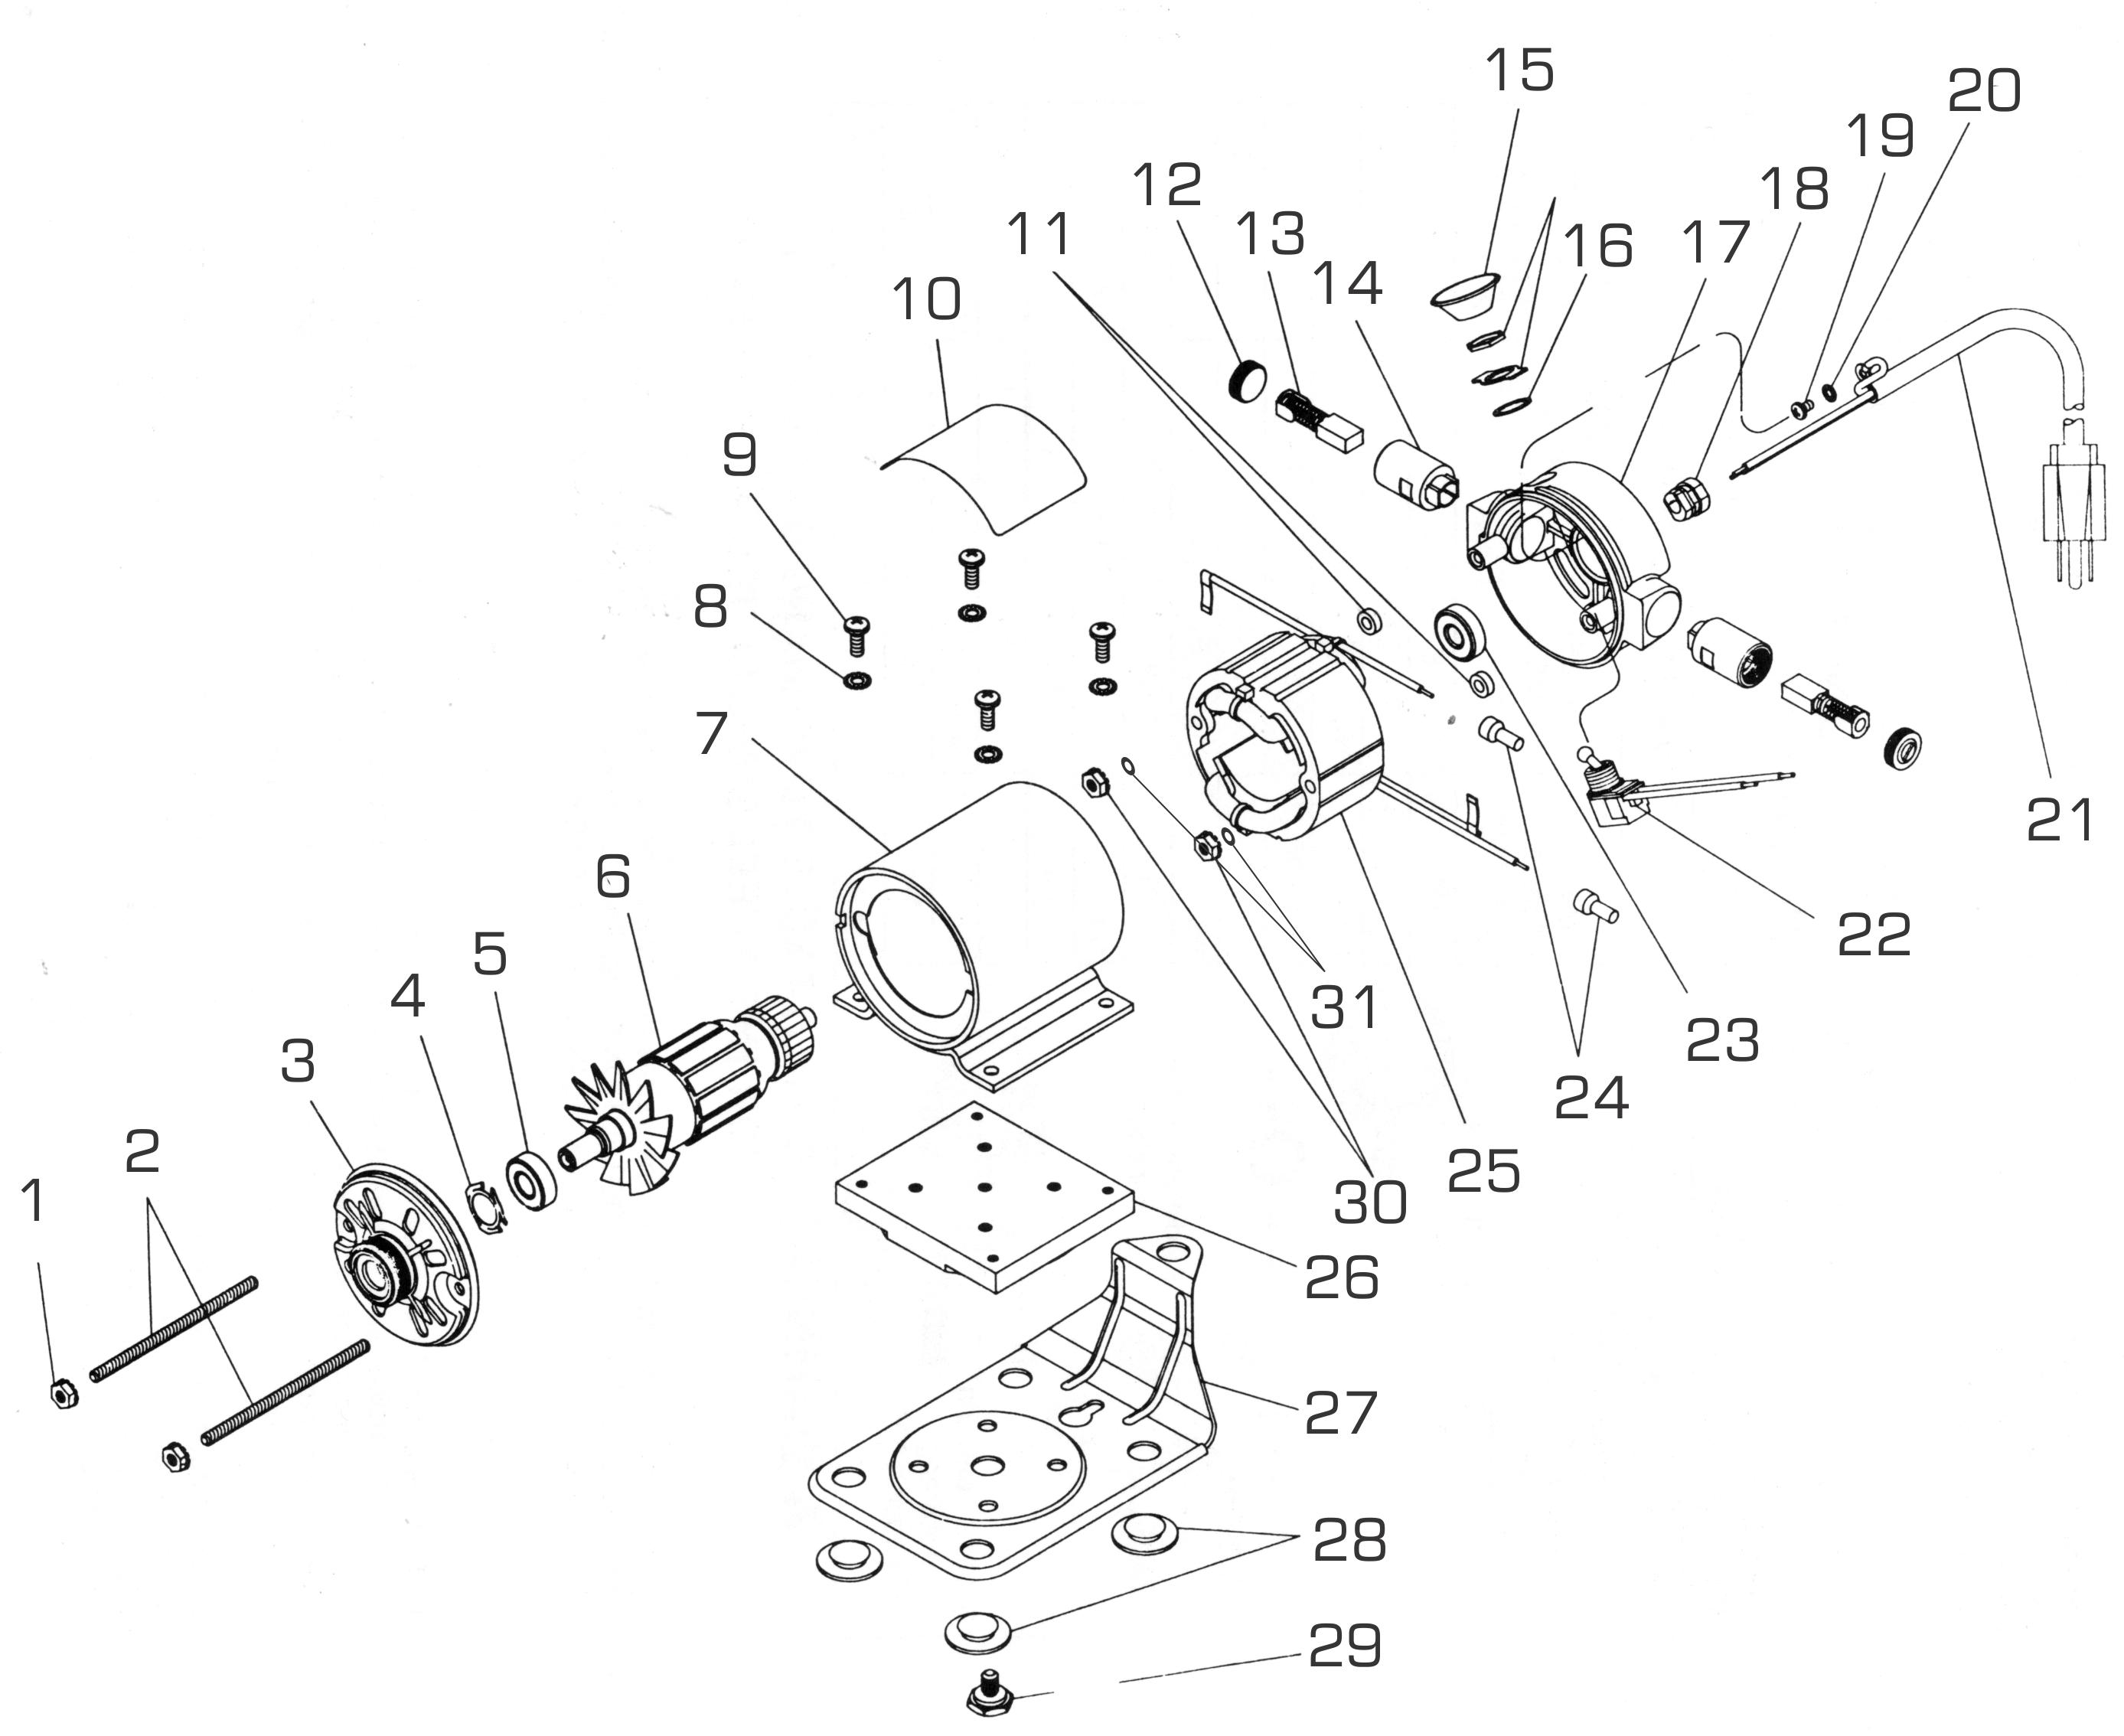 Dumore Series 1 Flexible Shaft Grinder Replacement Parts